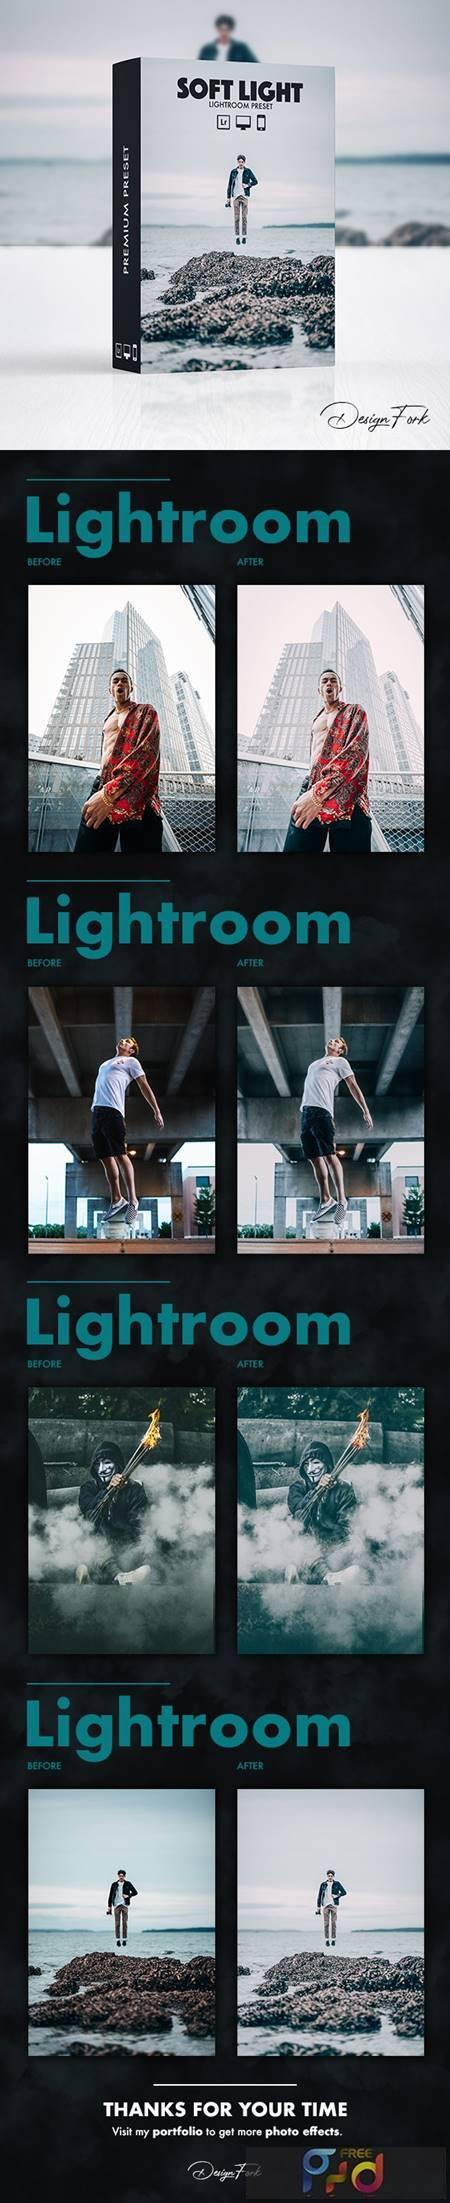 Soft Light Lightroom Preset 30177990 1